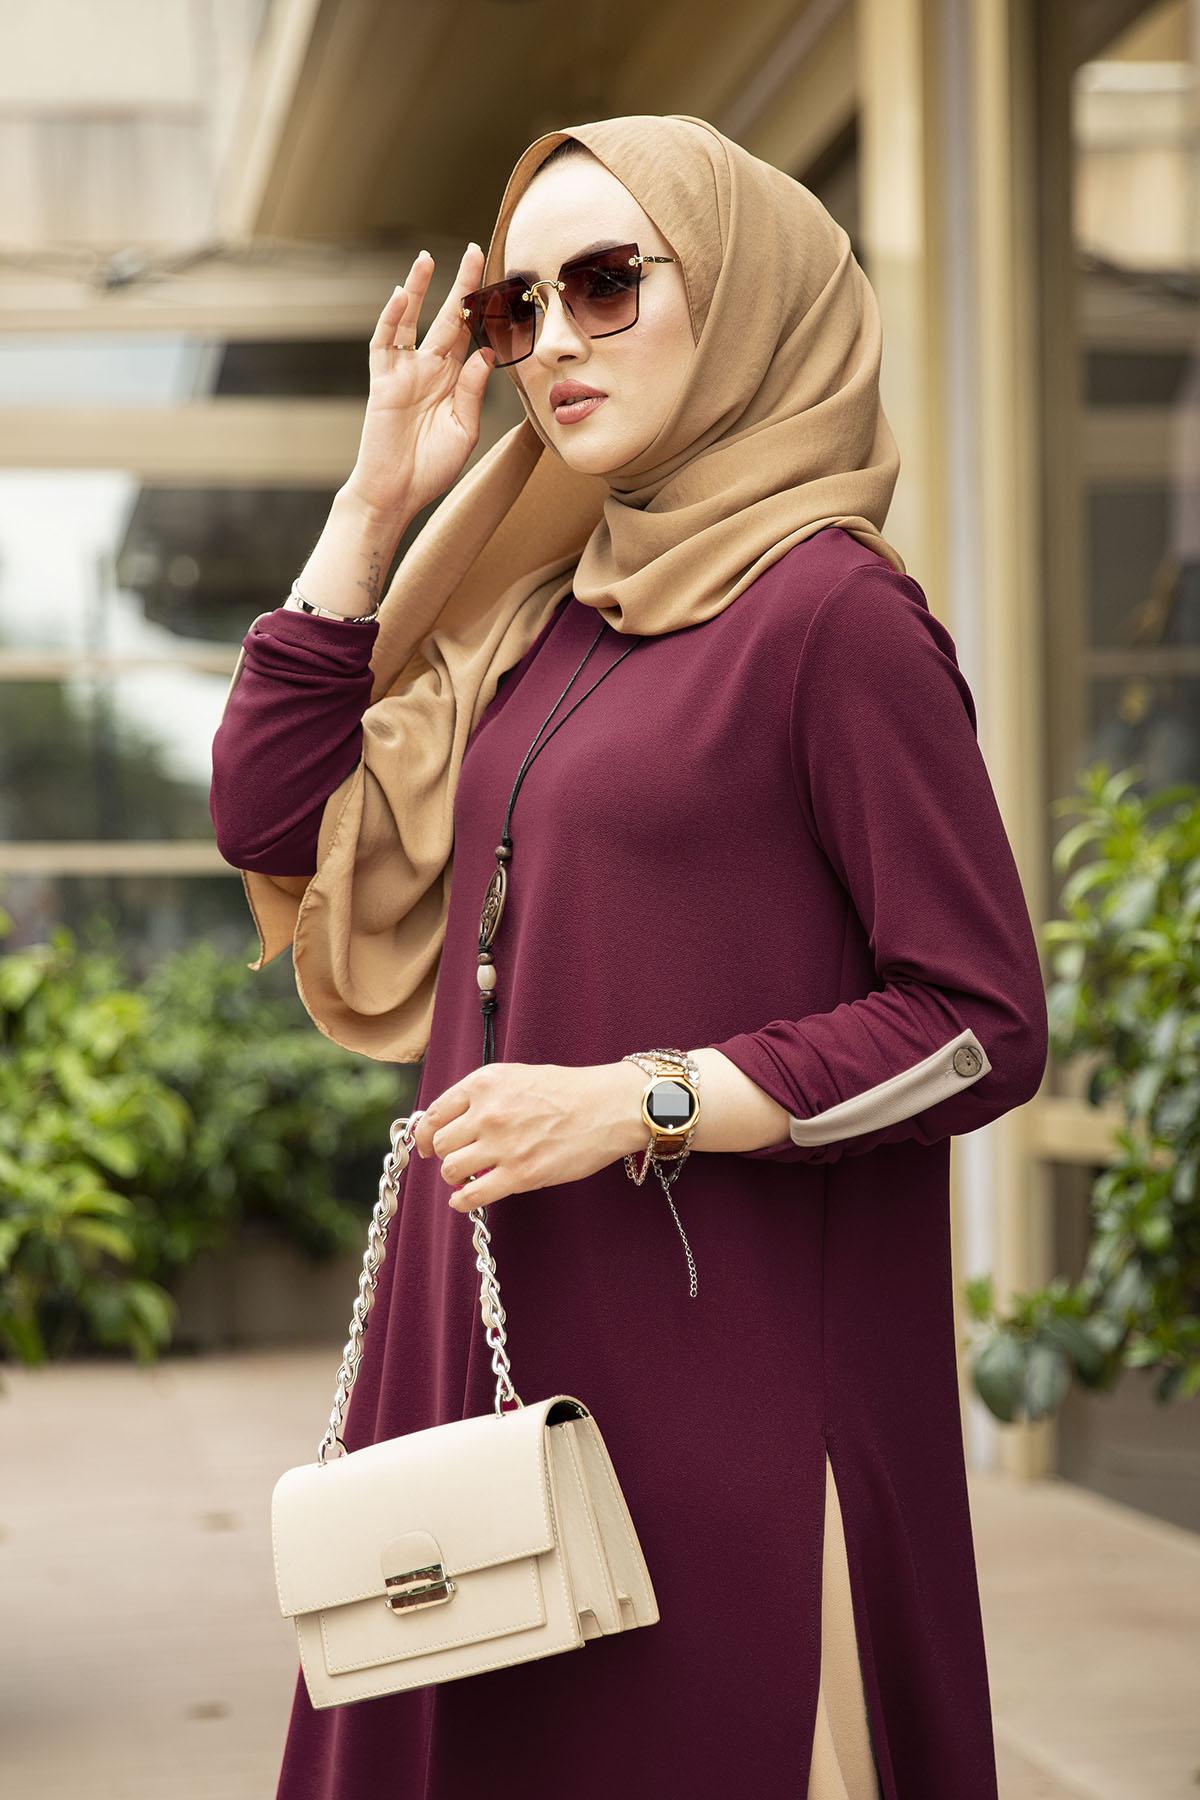 Magnolia 3 Piece Set Aid Mubarek Two pieces Muslim Sets Abaya Turkey Hijab Dress Caftan Kaftans Islam Clothing Abayas For Women